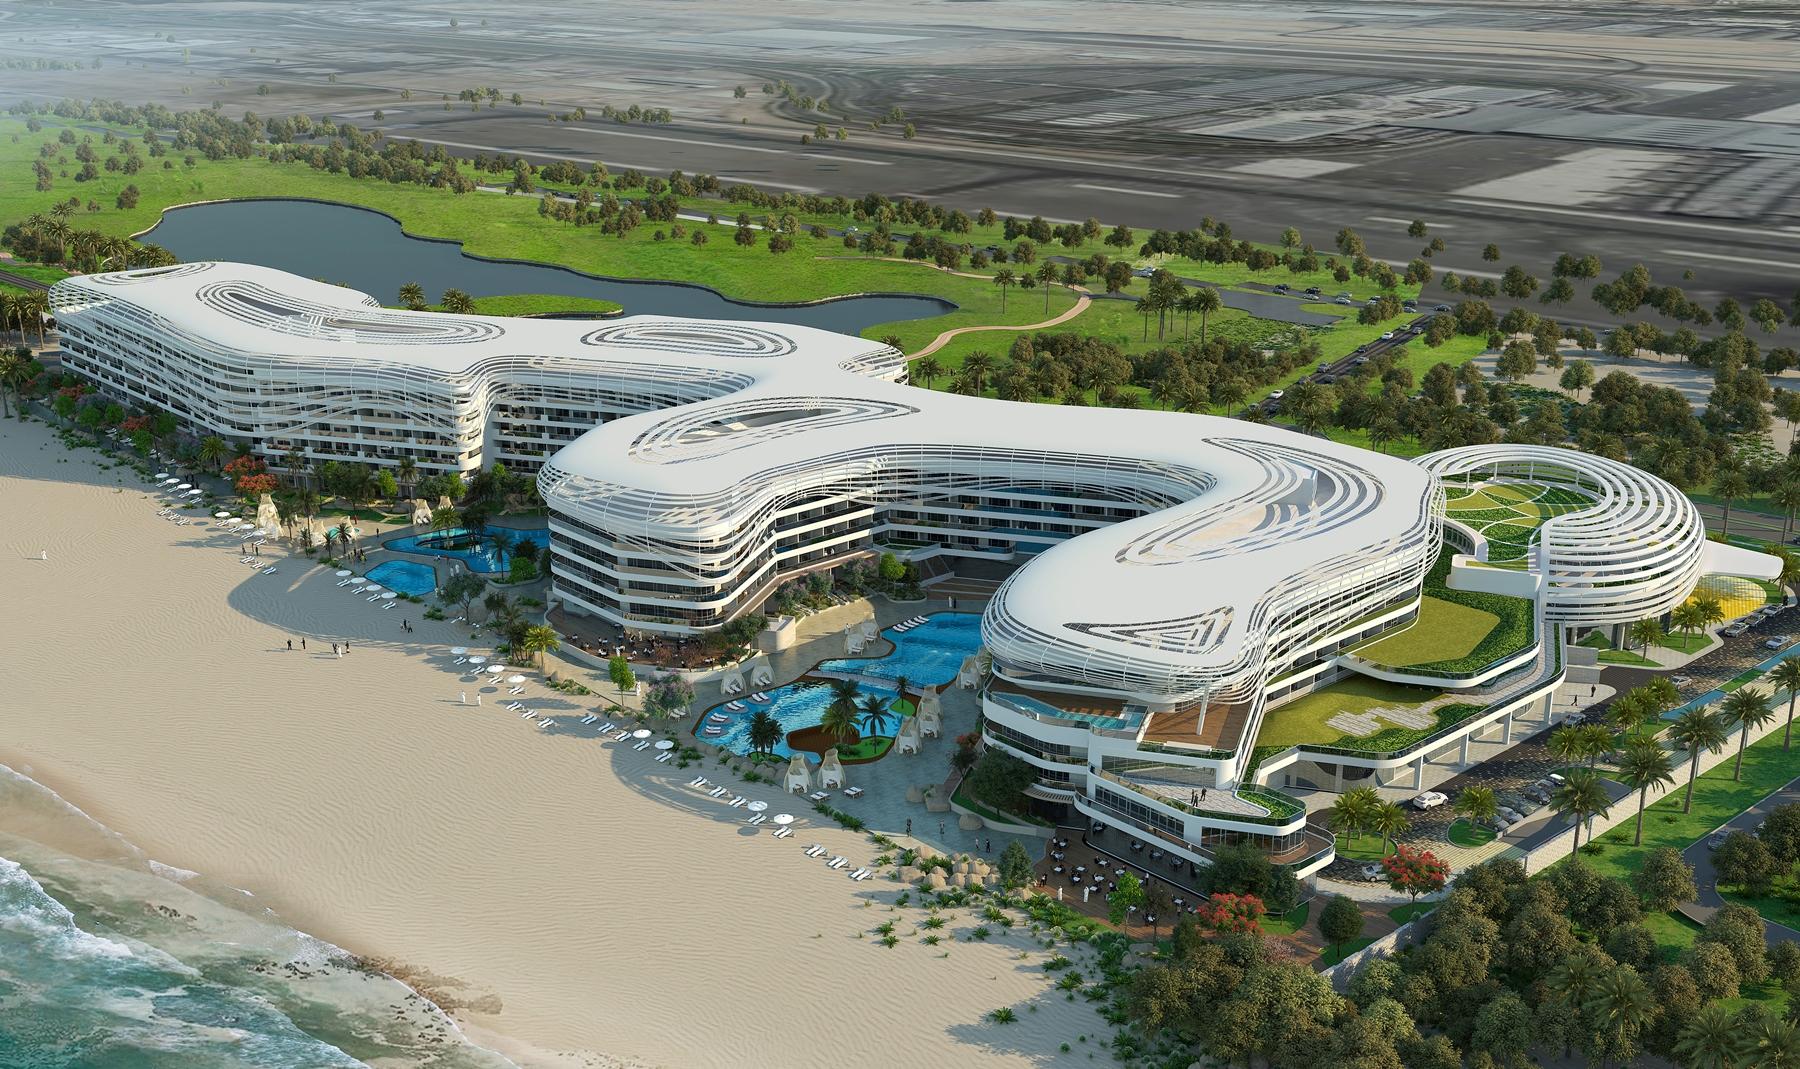 Rendering of The St. Regis Al Mouj Muscat Resort